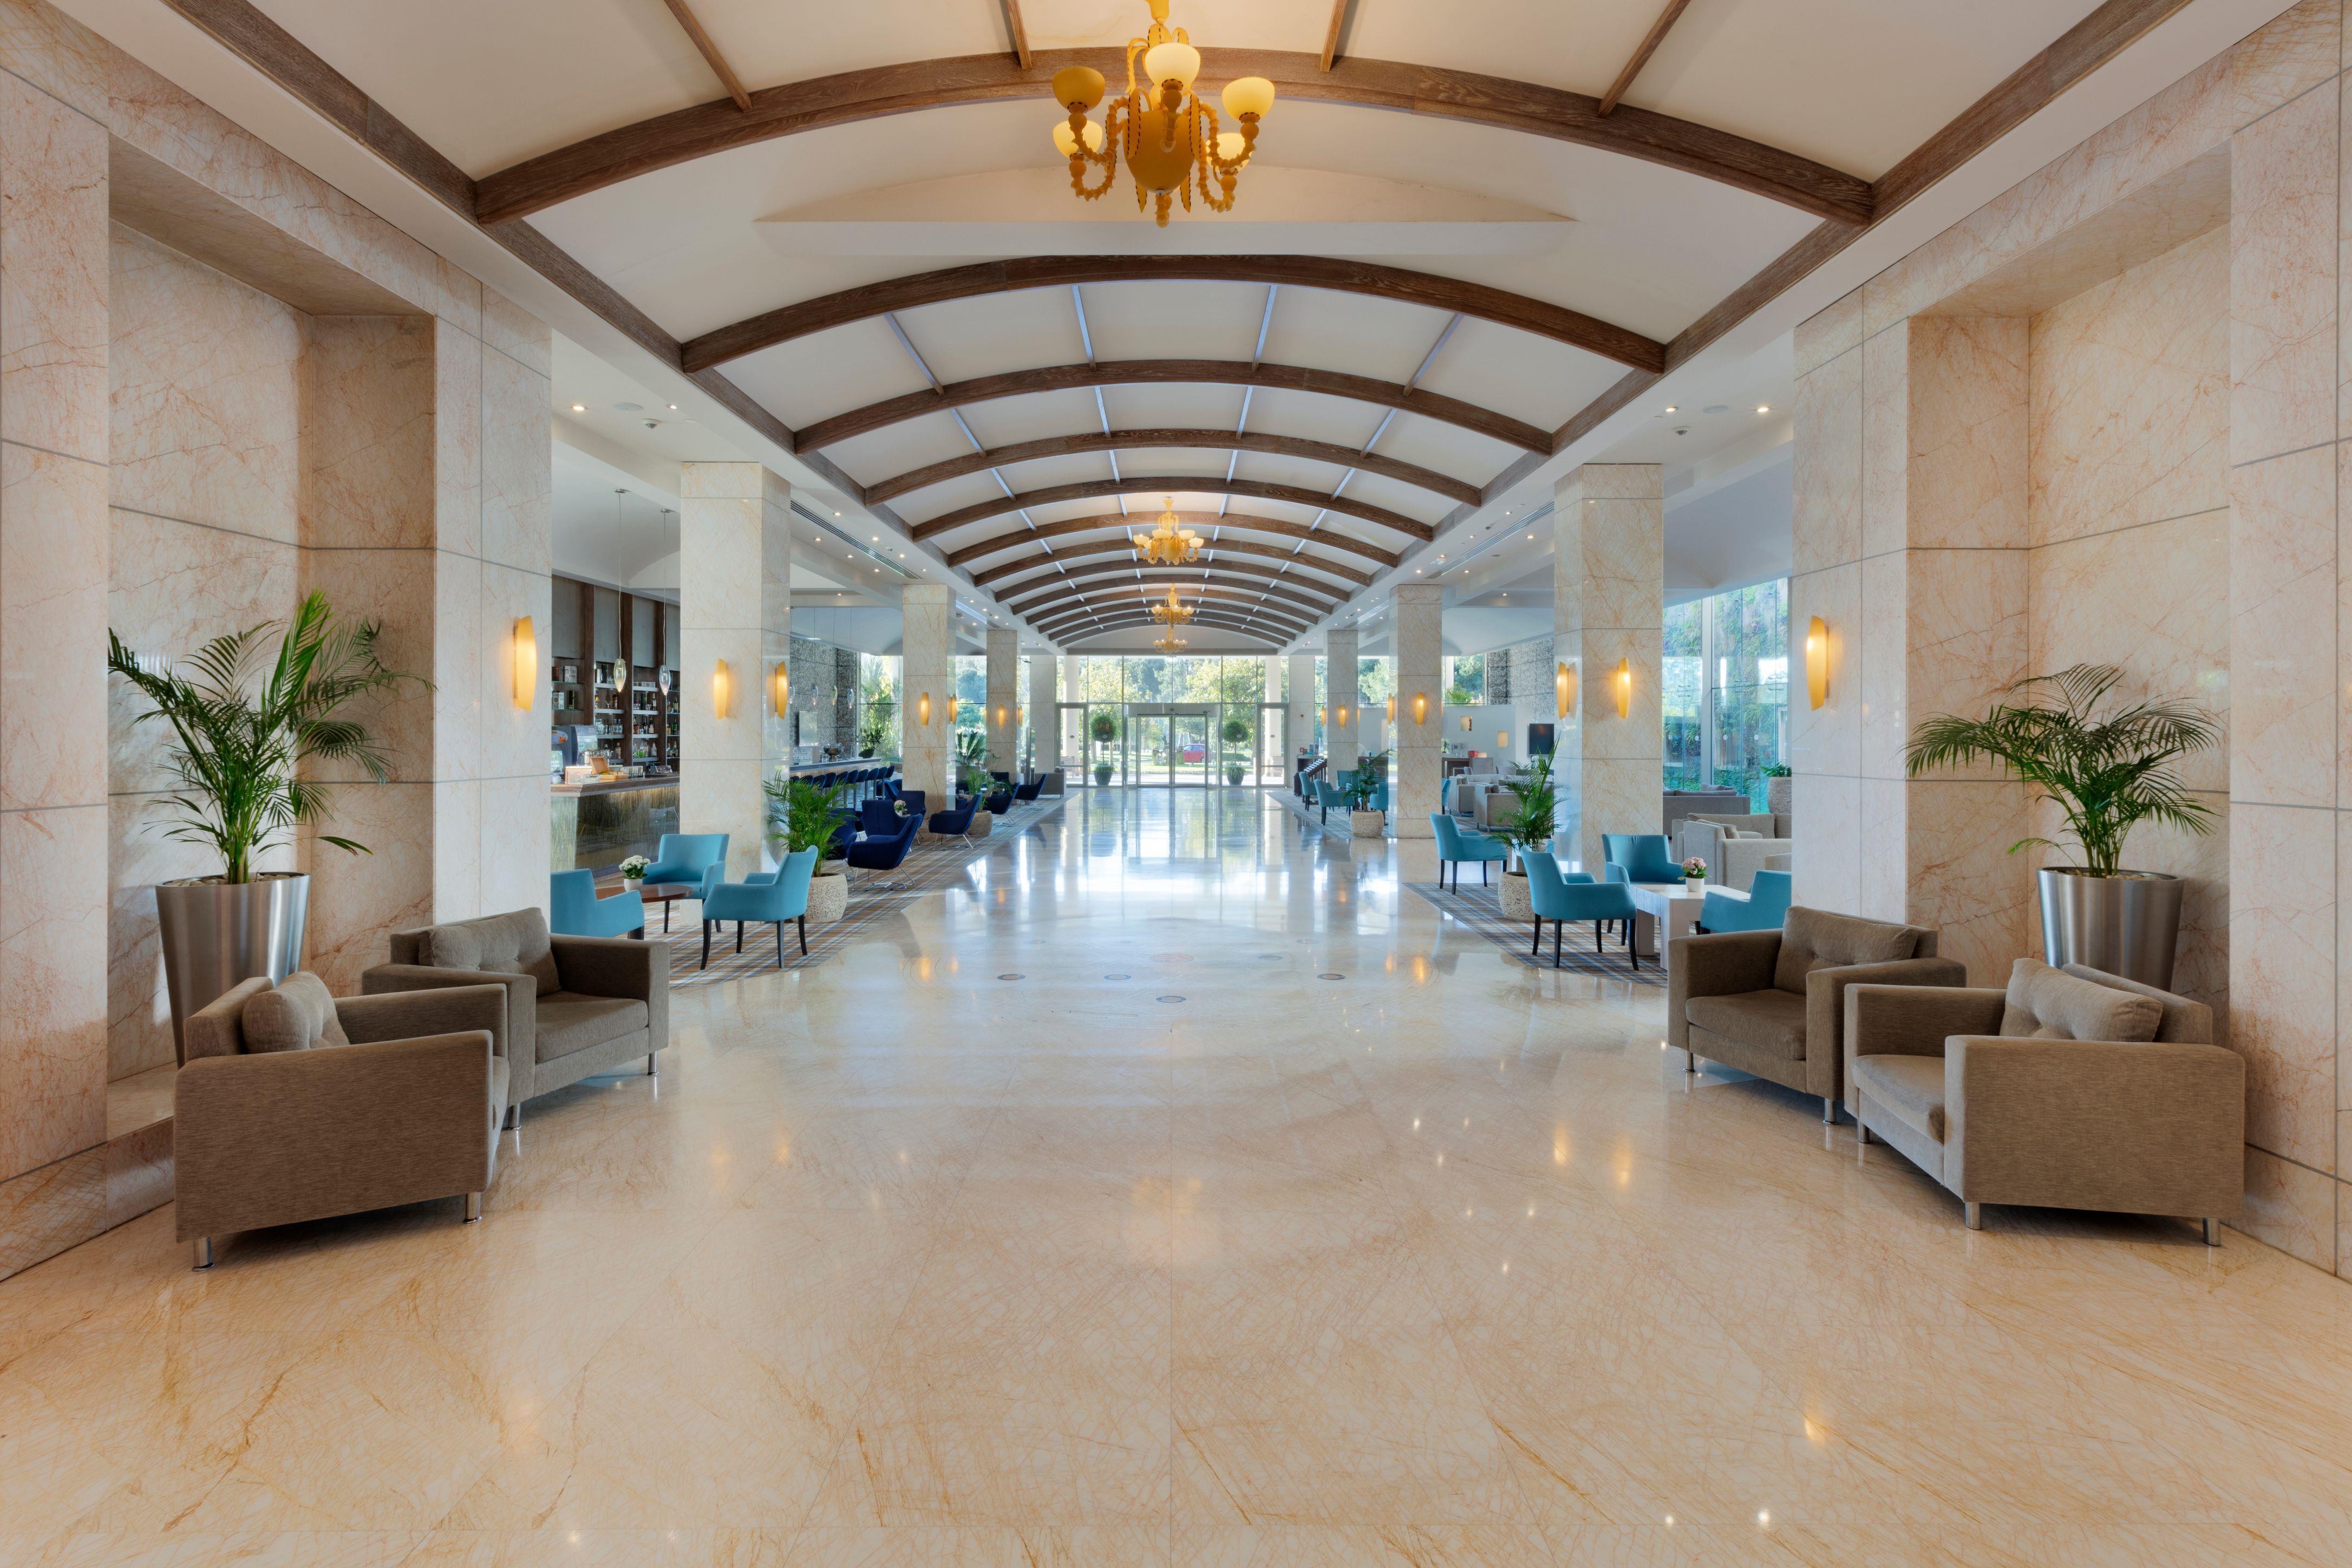 http://www.orextravel.sk/OREX/hotelphotos/zeynep-hotel-general-0021.jpg